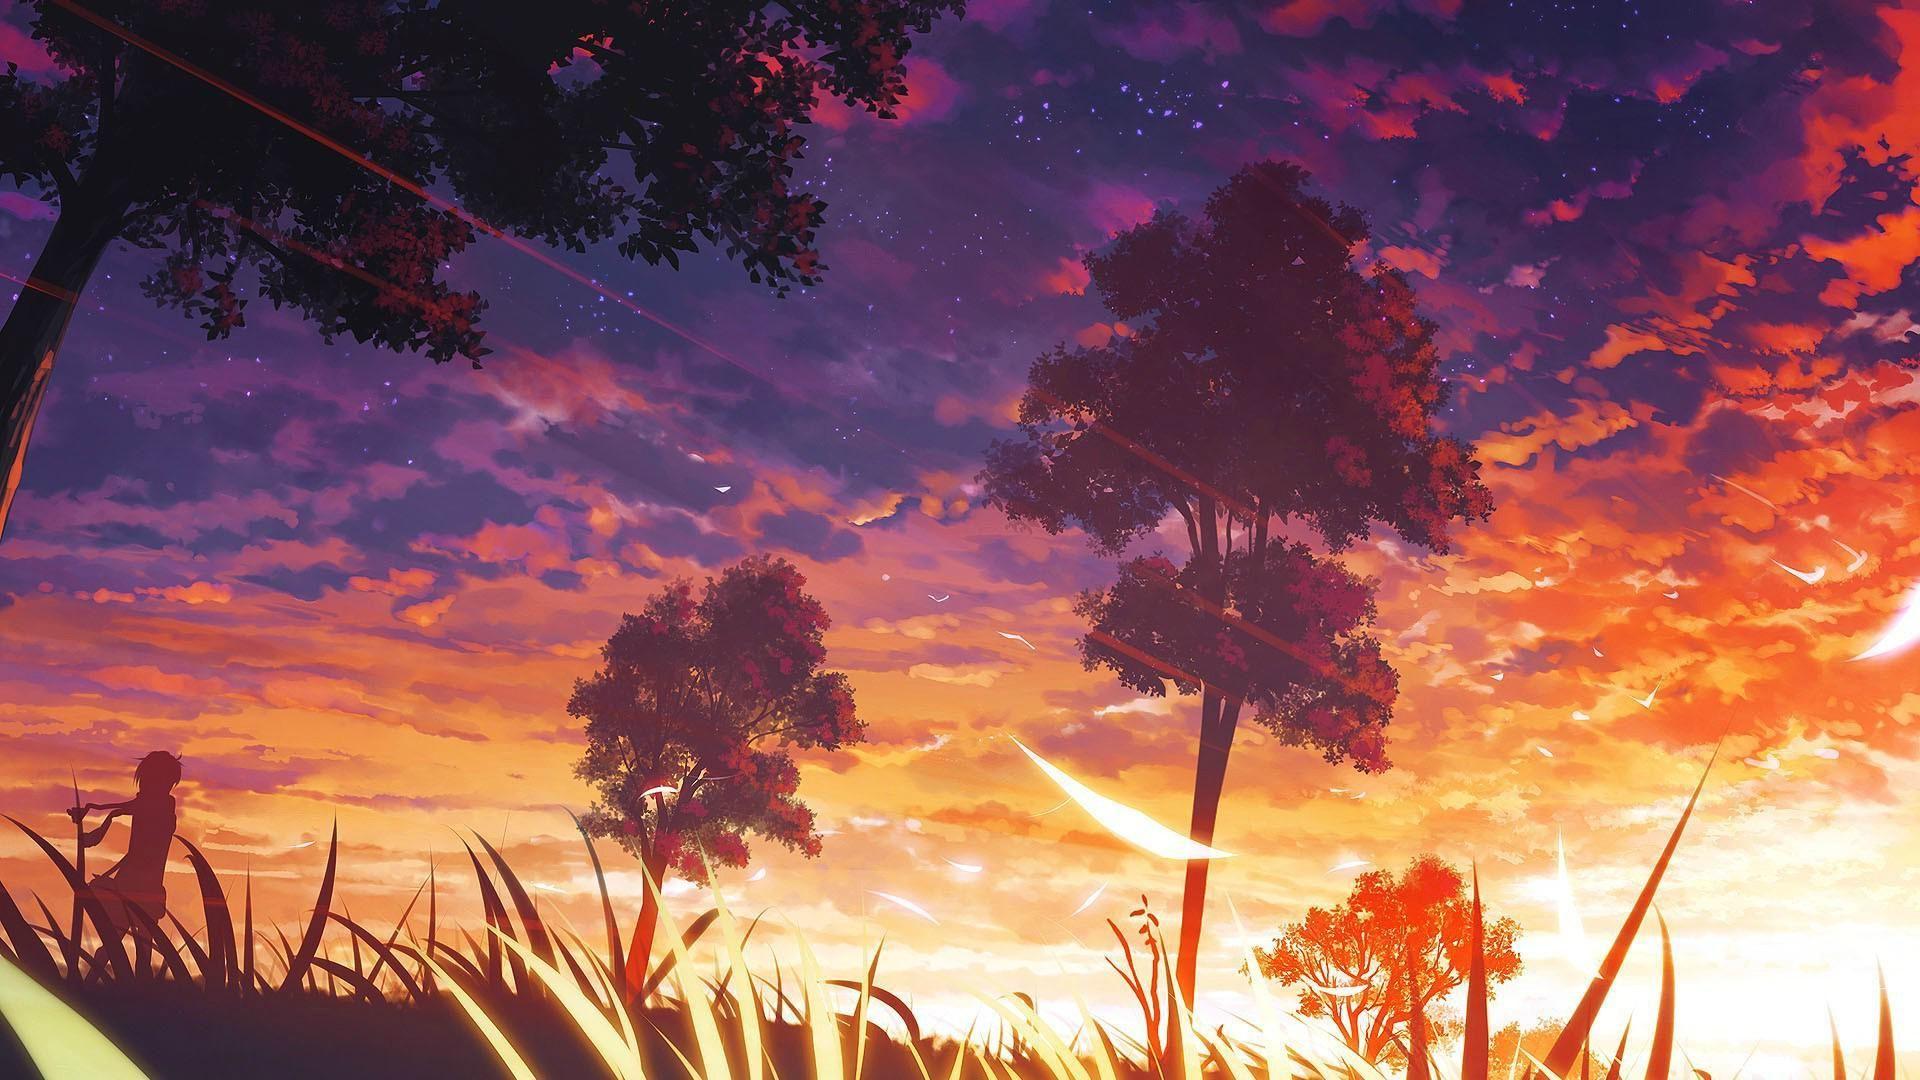 60 Anime Sunset Wallpapers Download at WallpaperBro